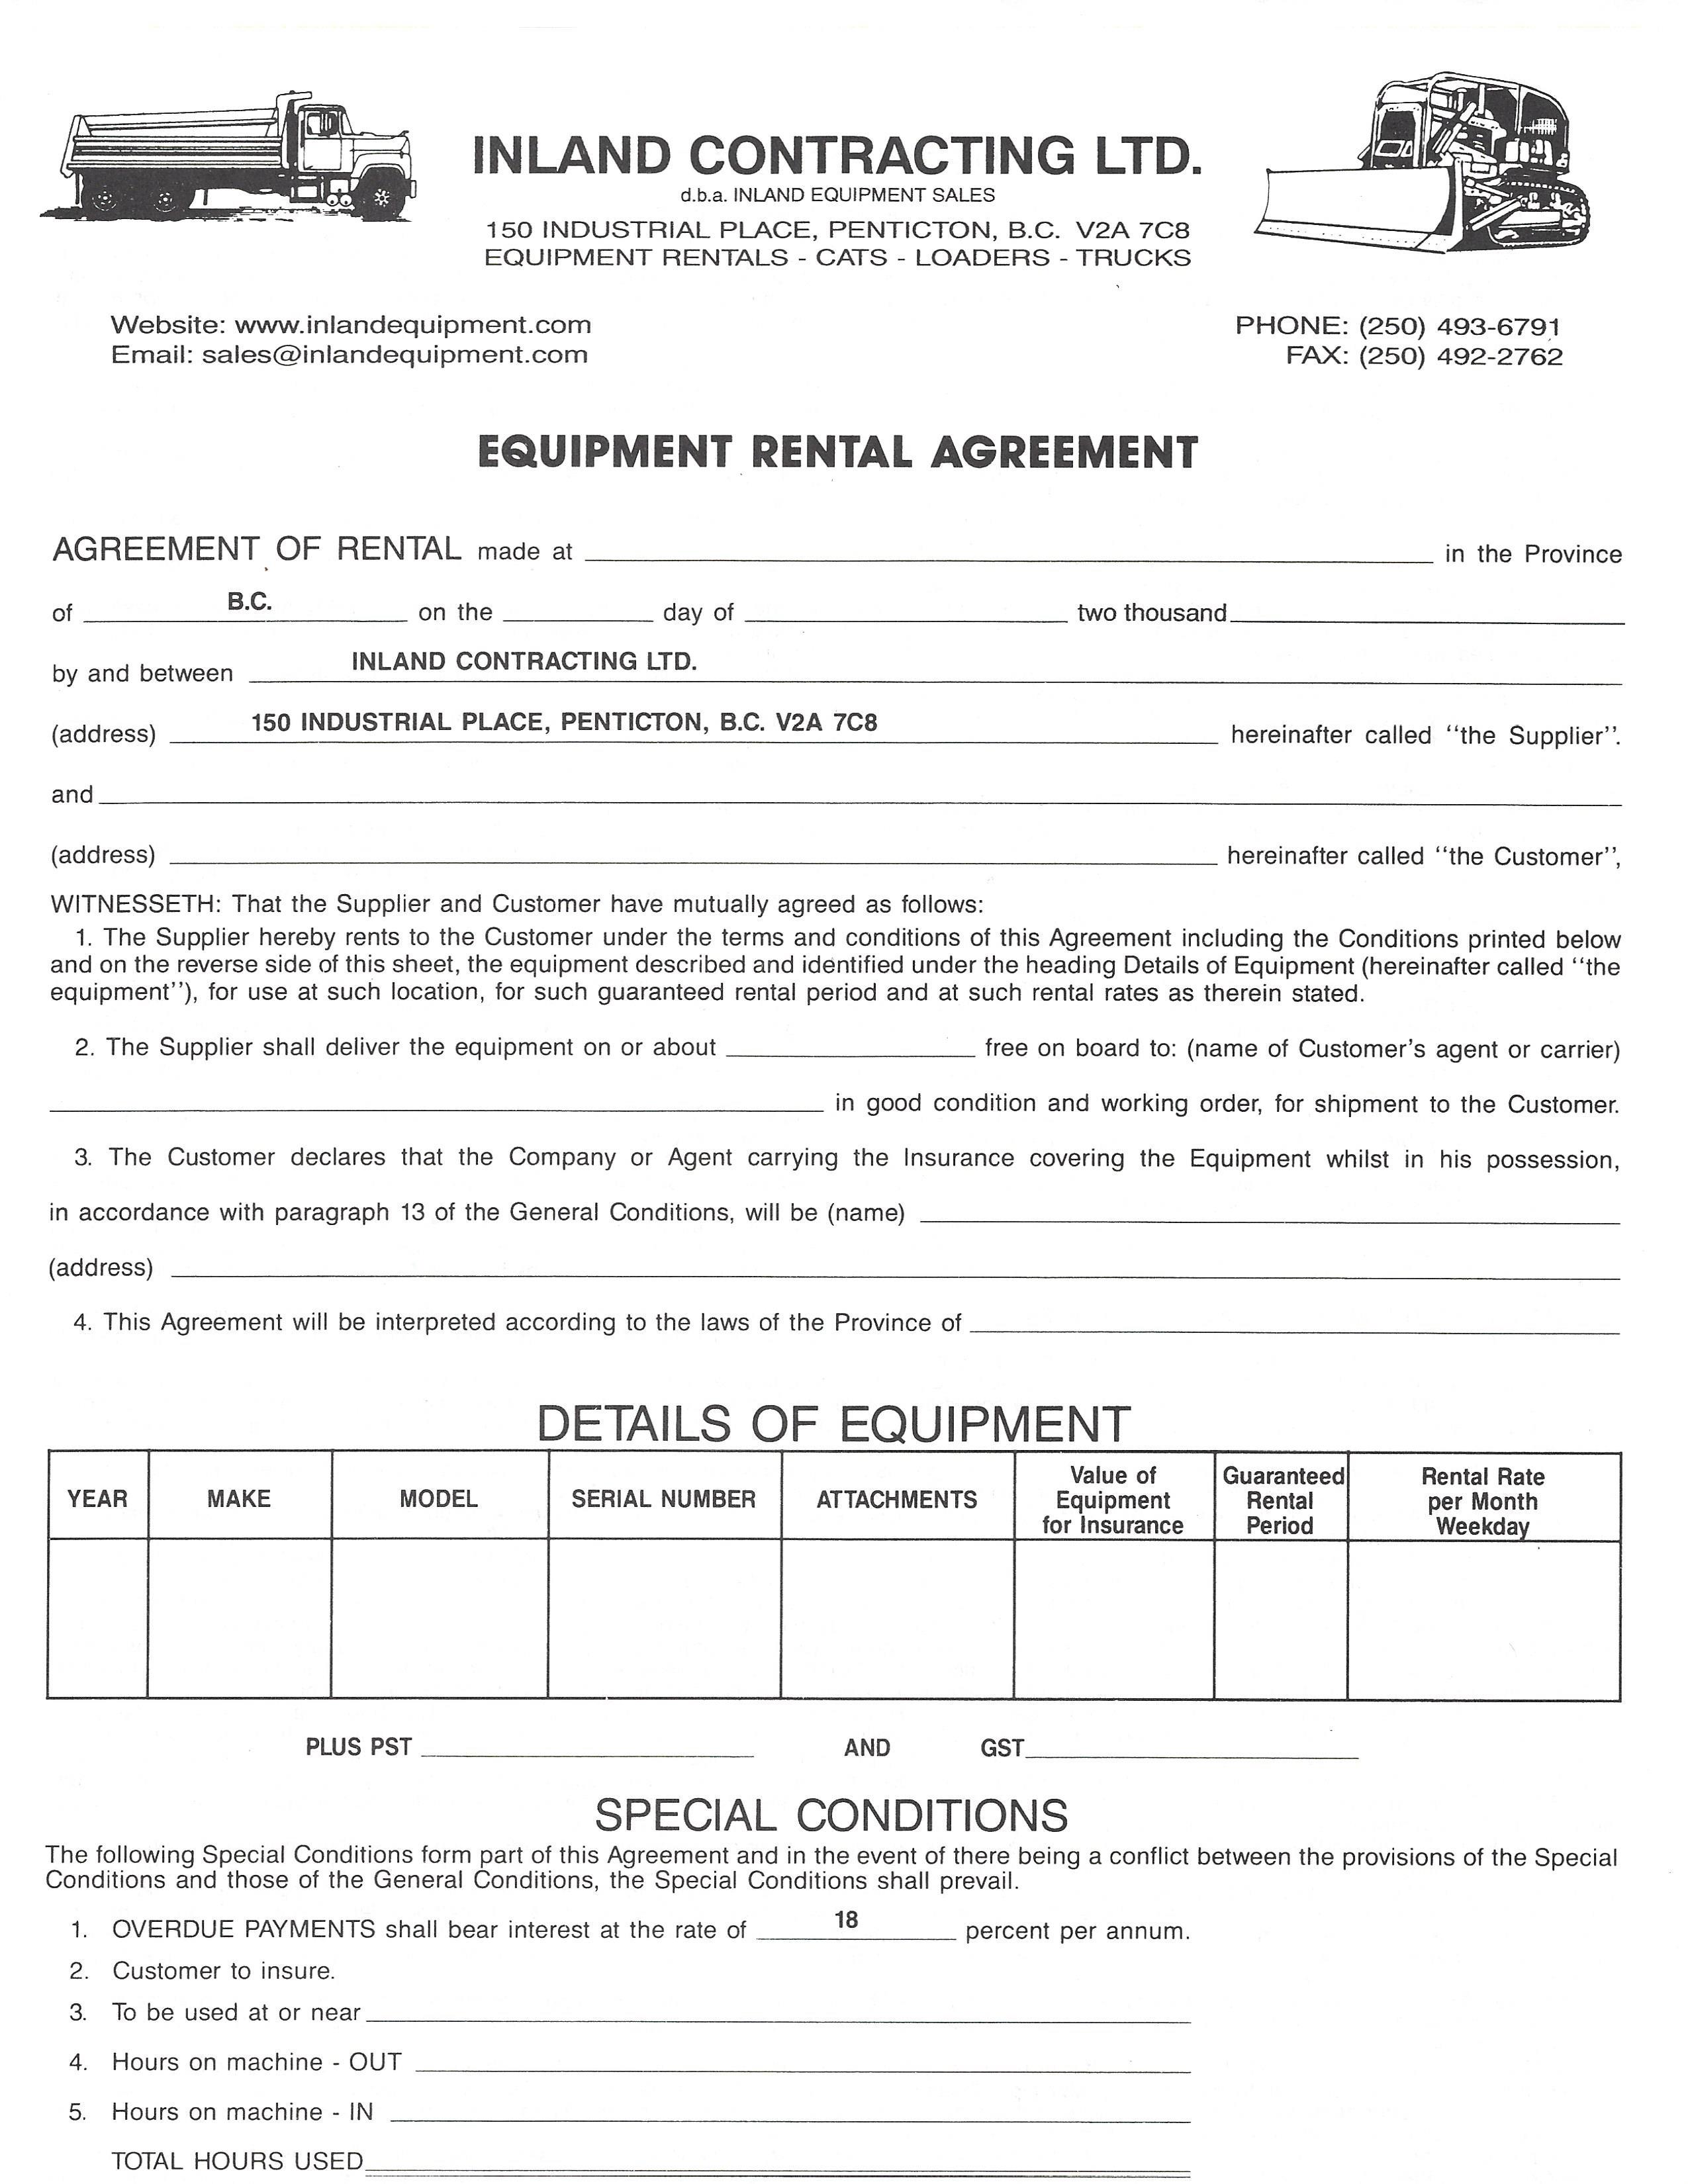 Rental Agreement Inland Equipment Sales